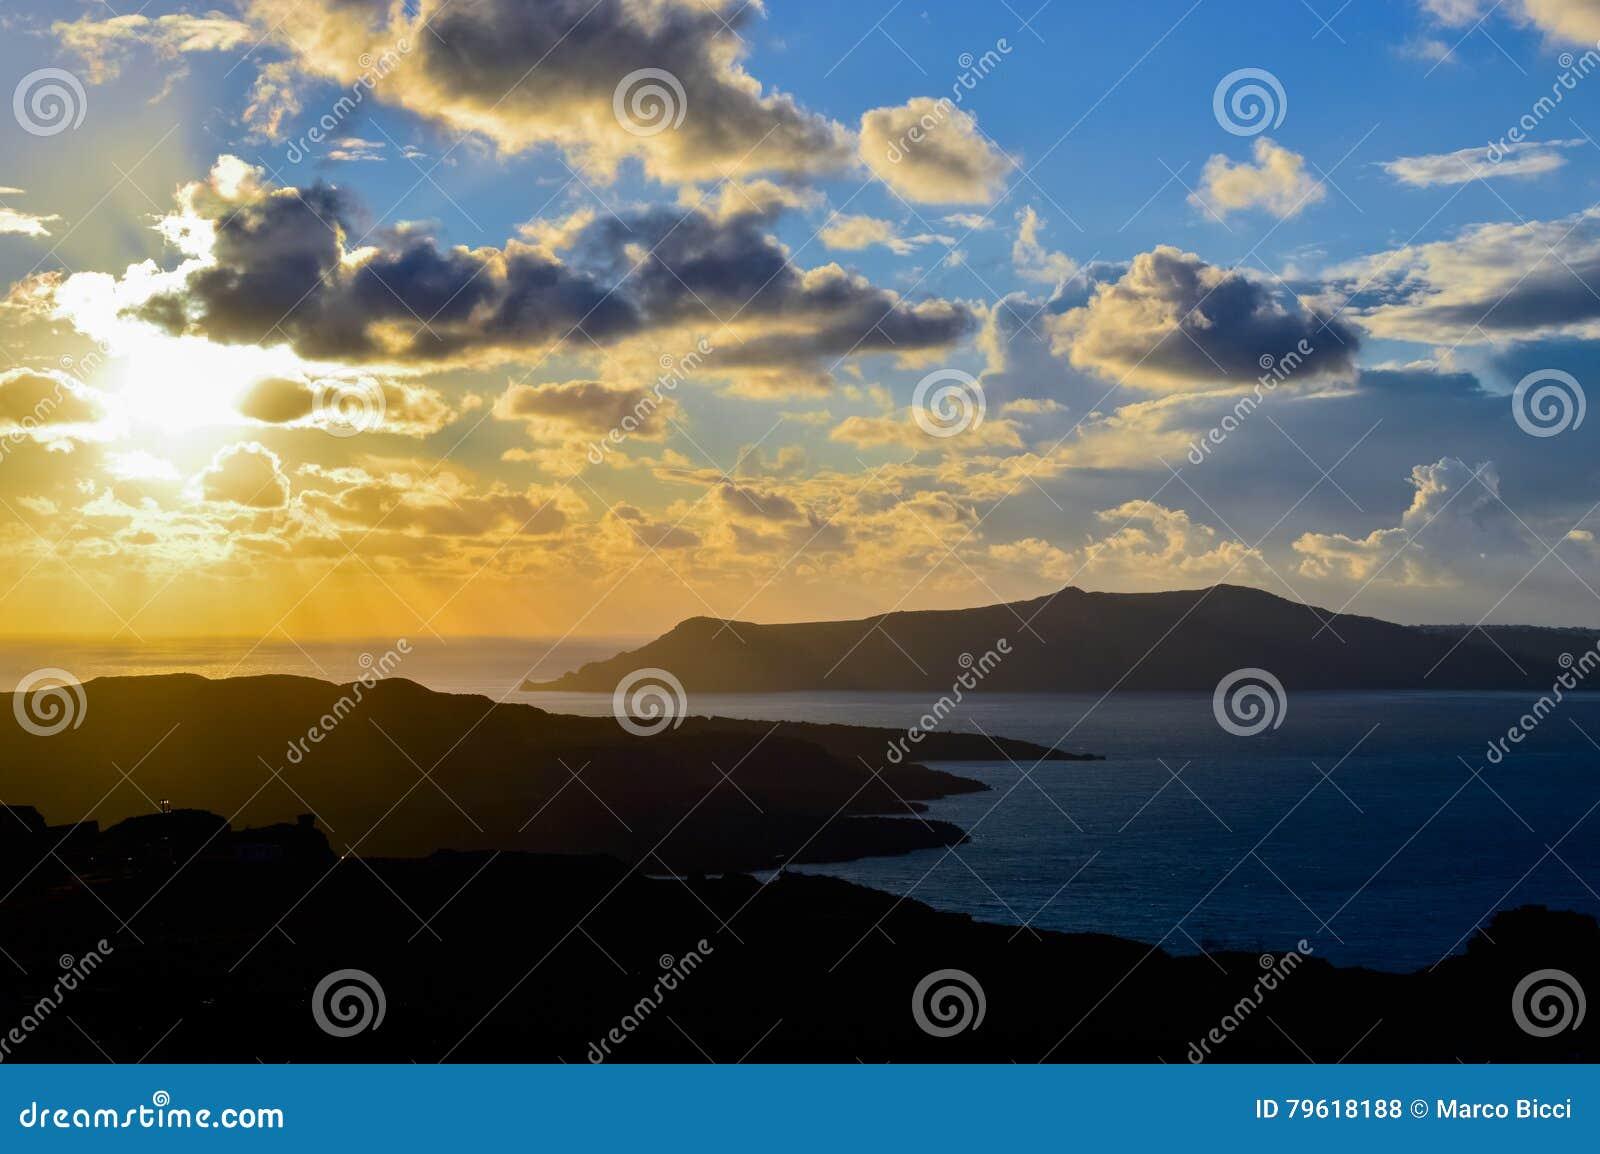 The Caldera of Santorini at